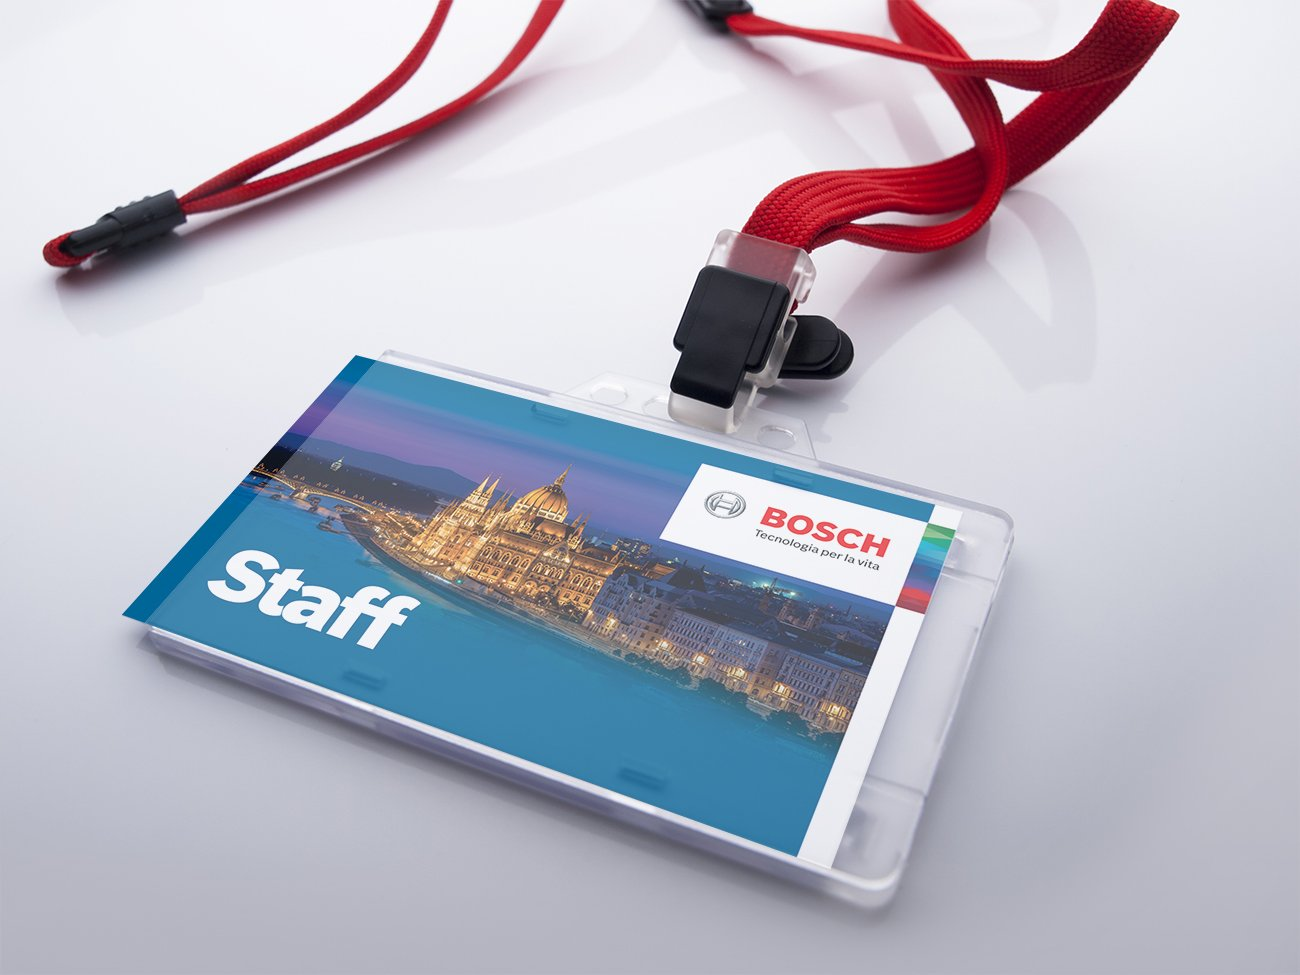 Bosch_badge